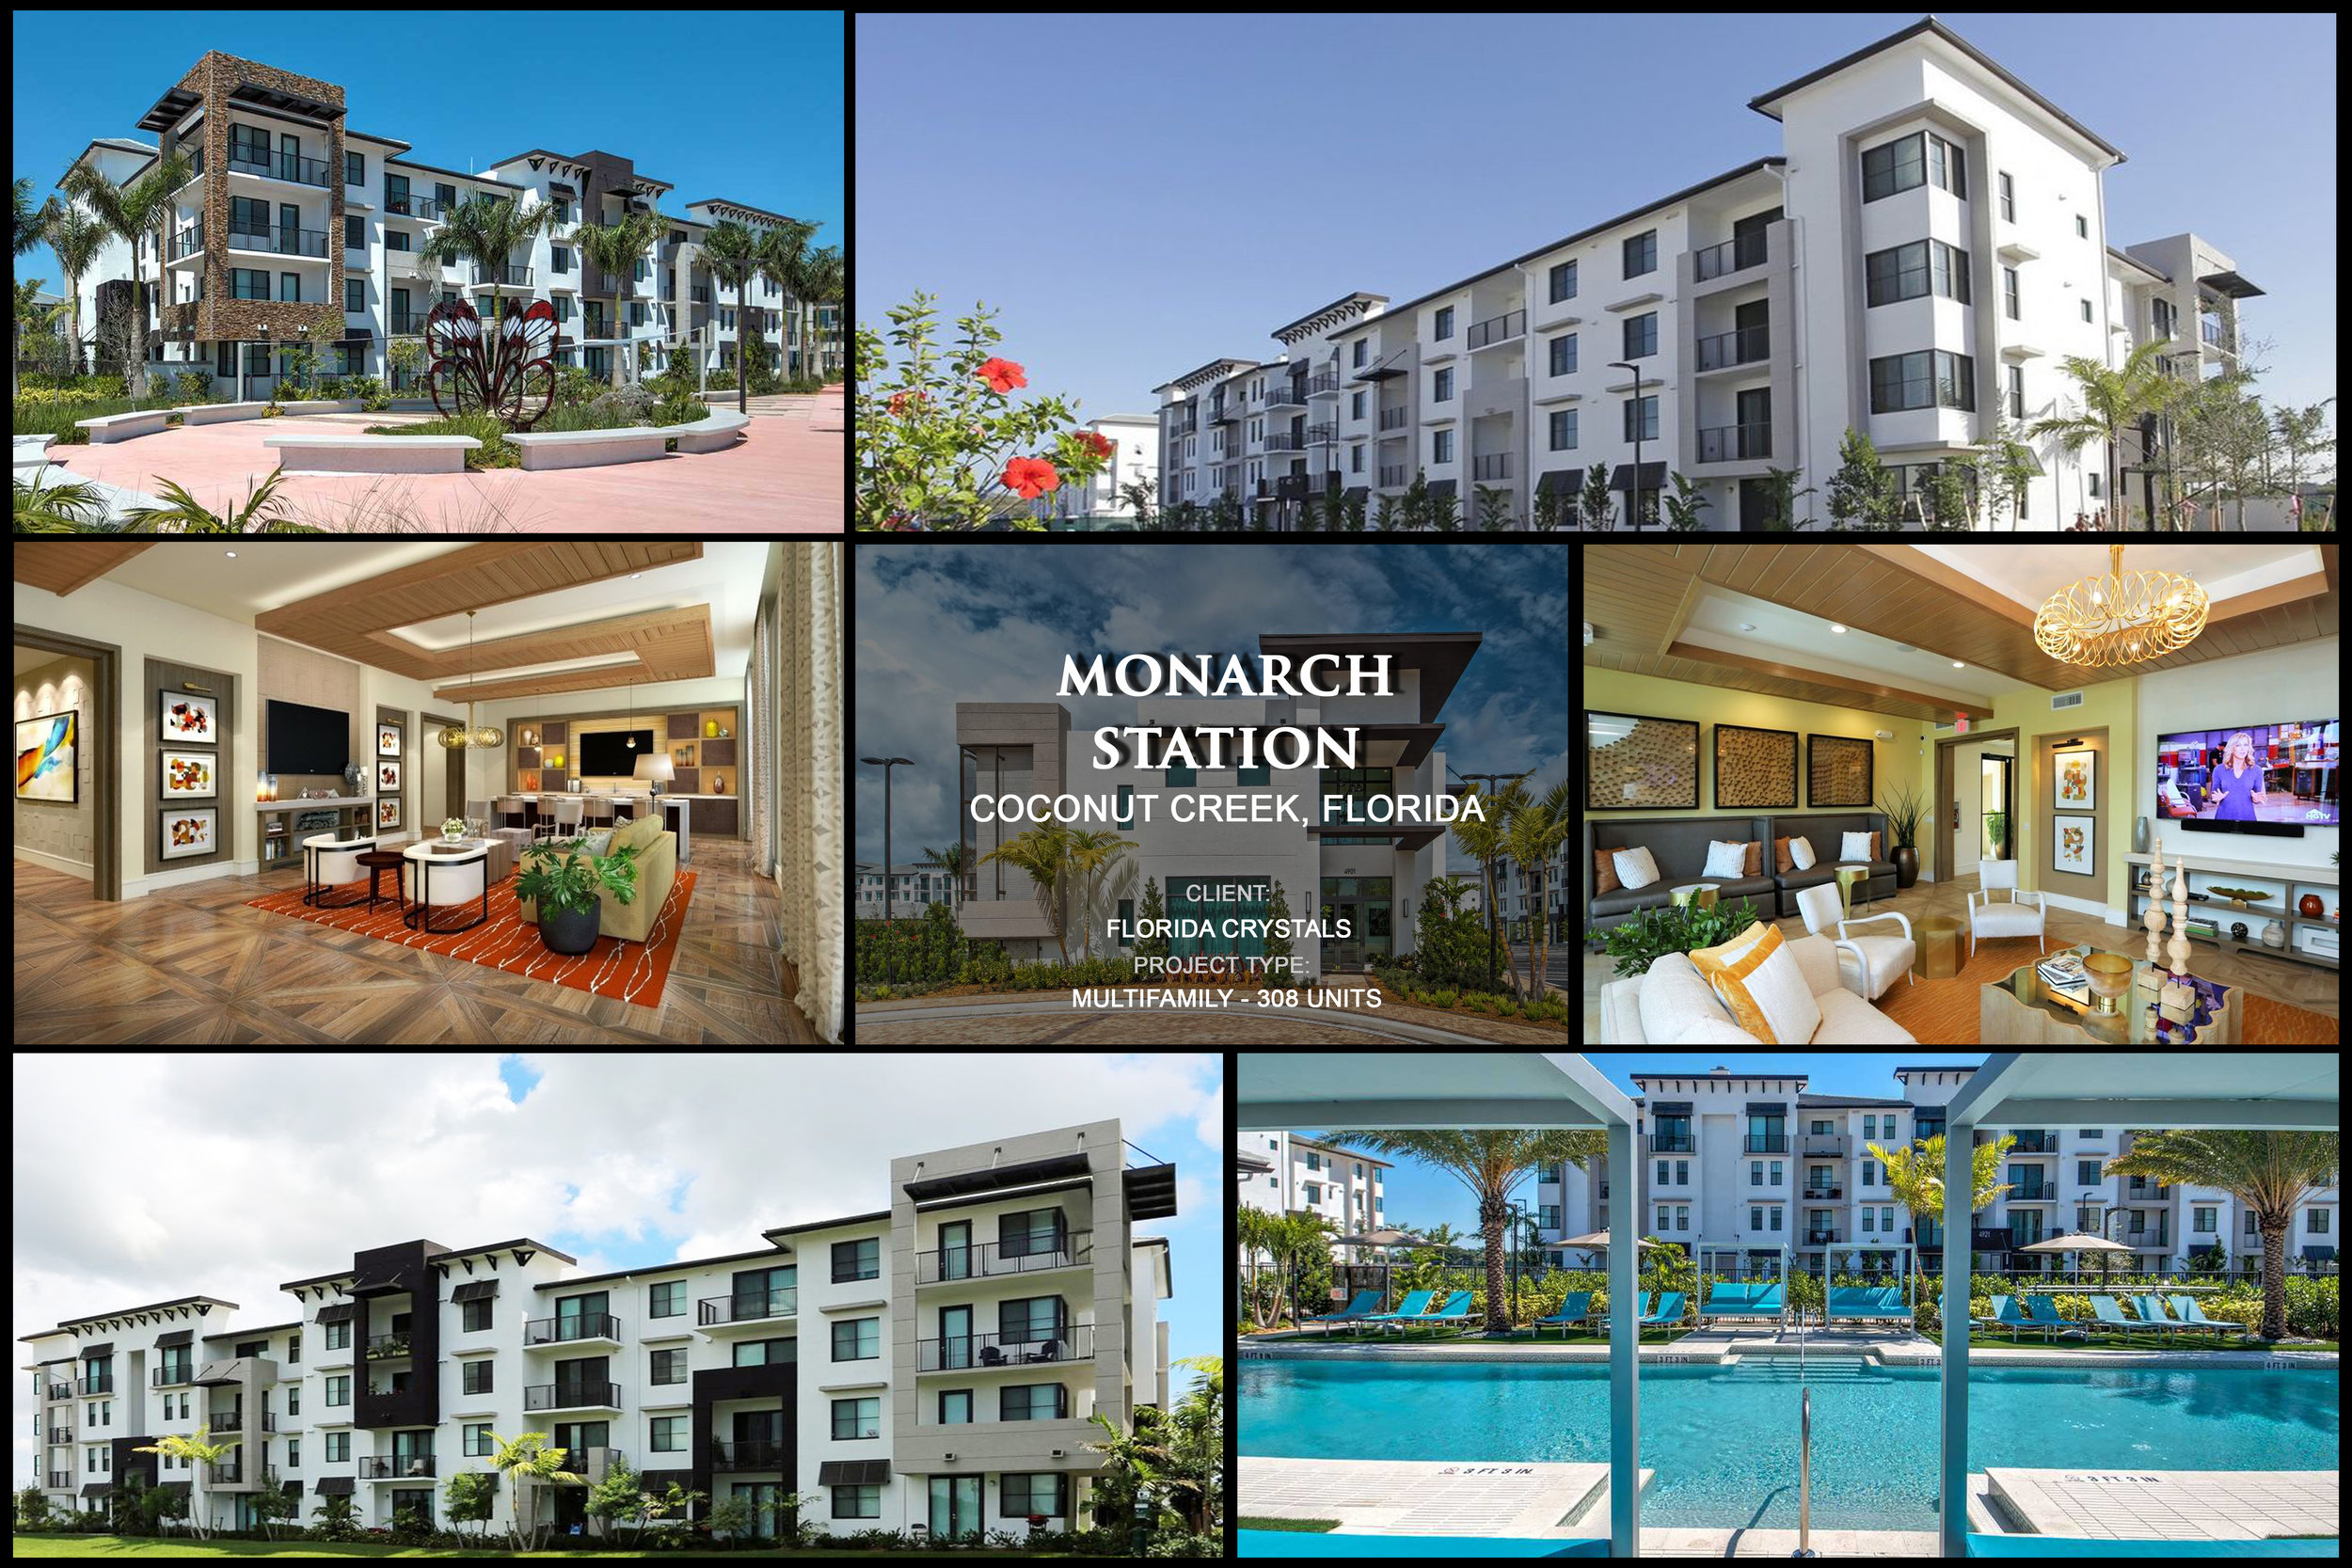 Monarch Station